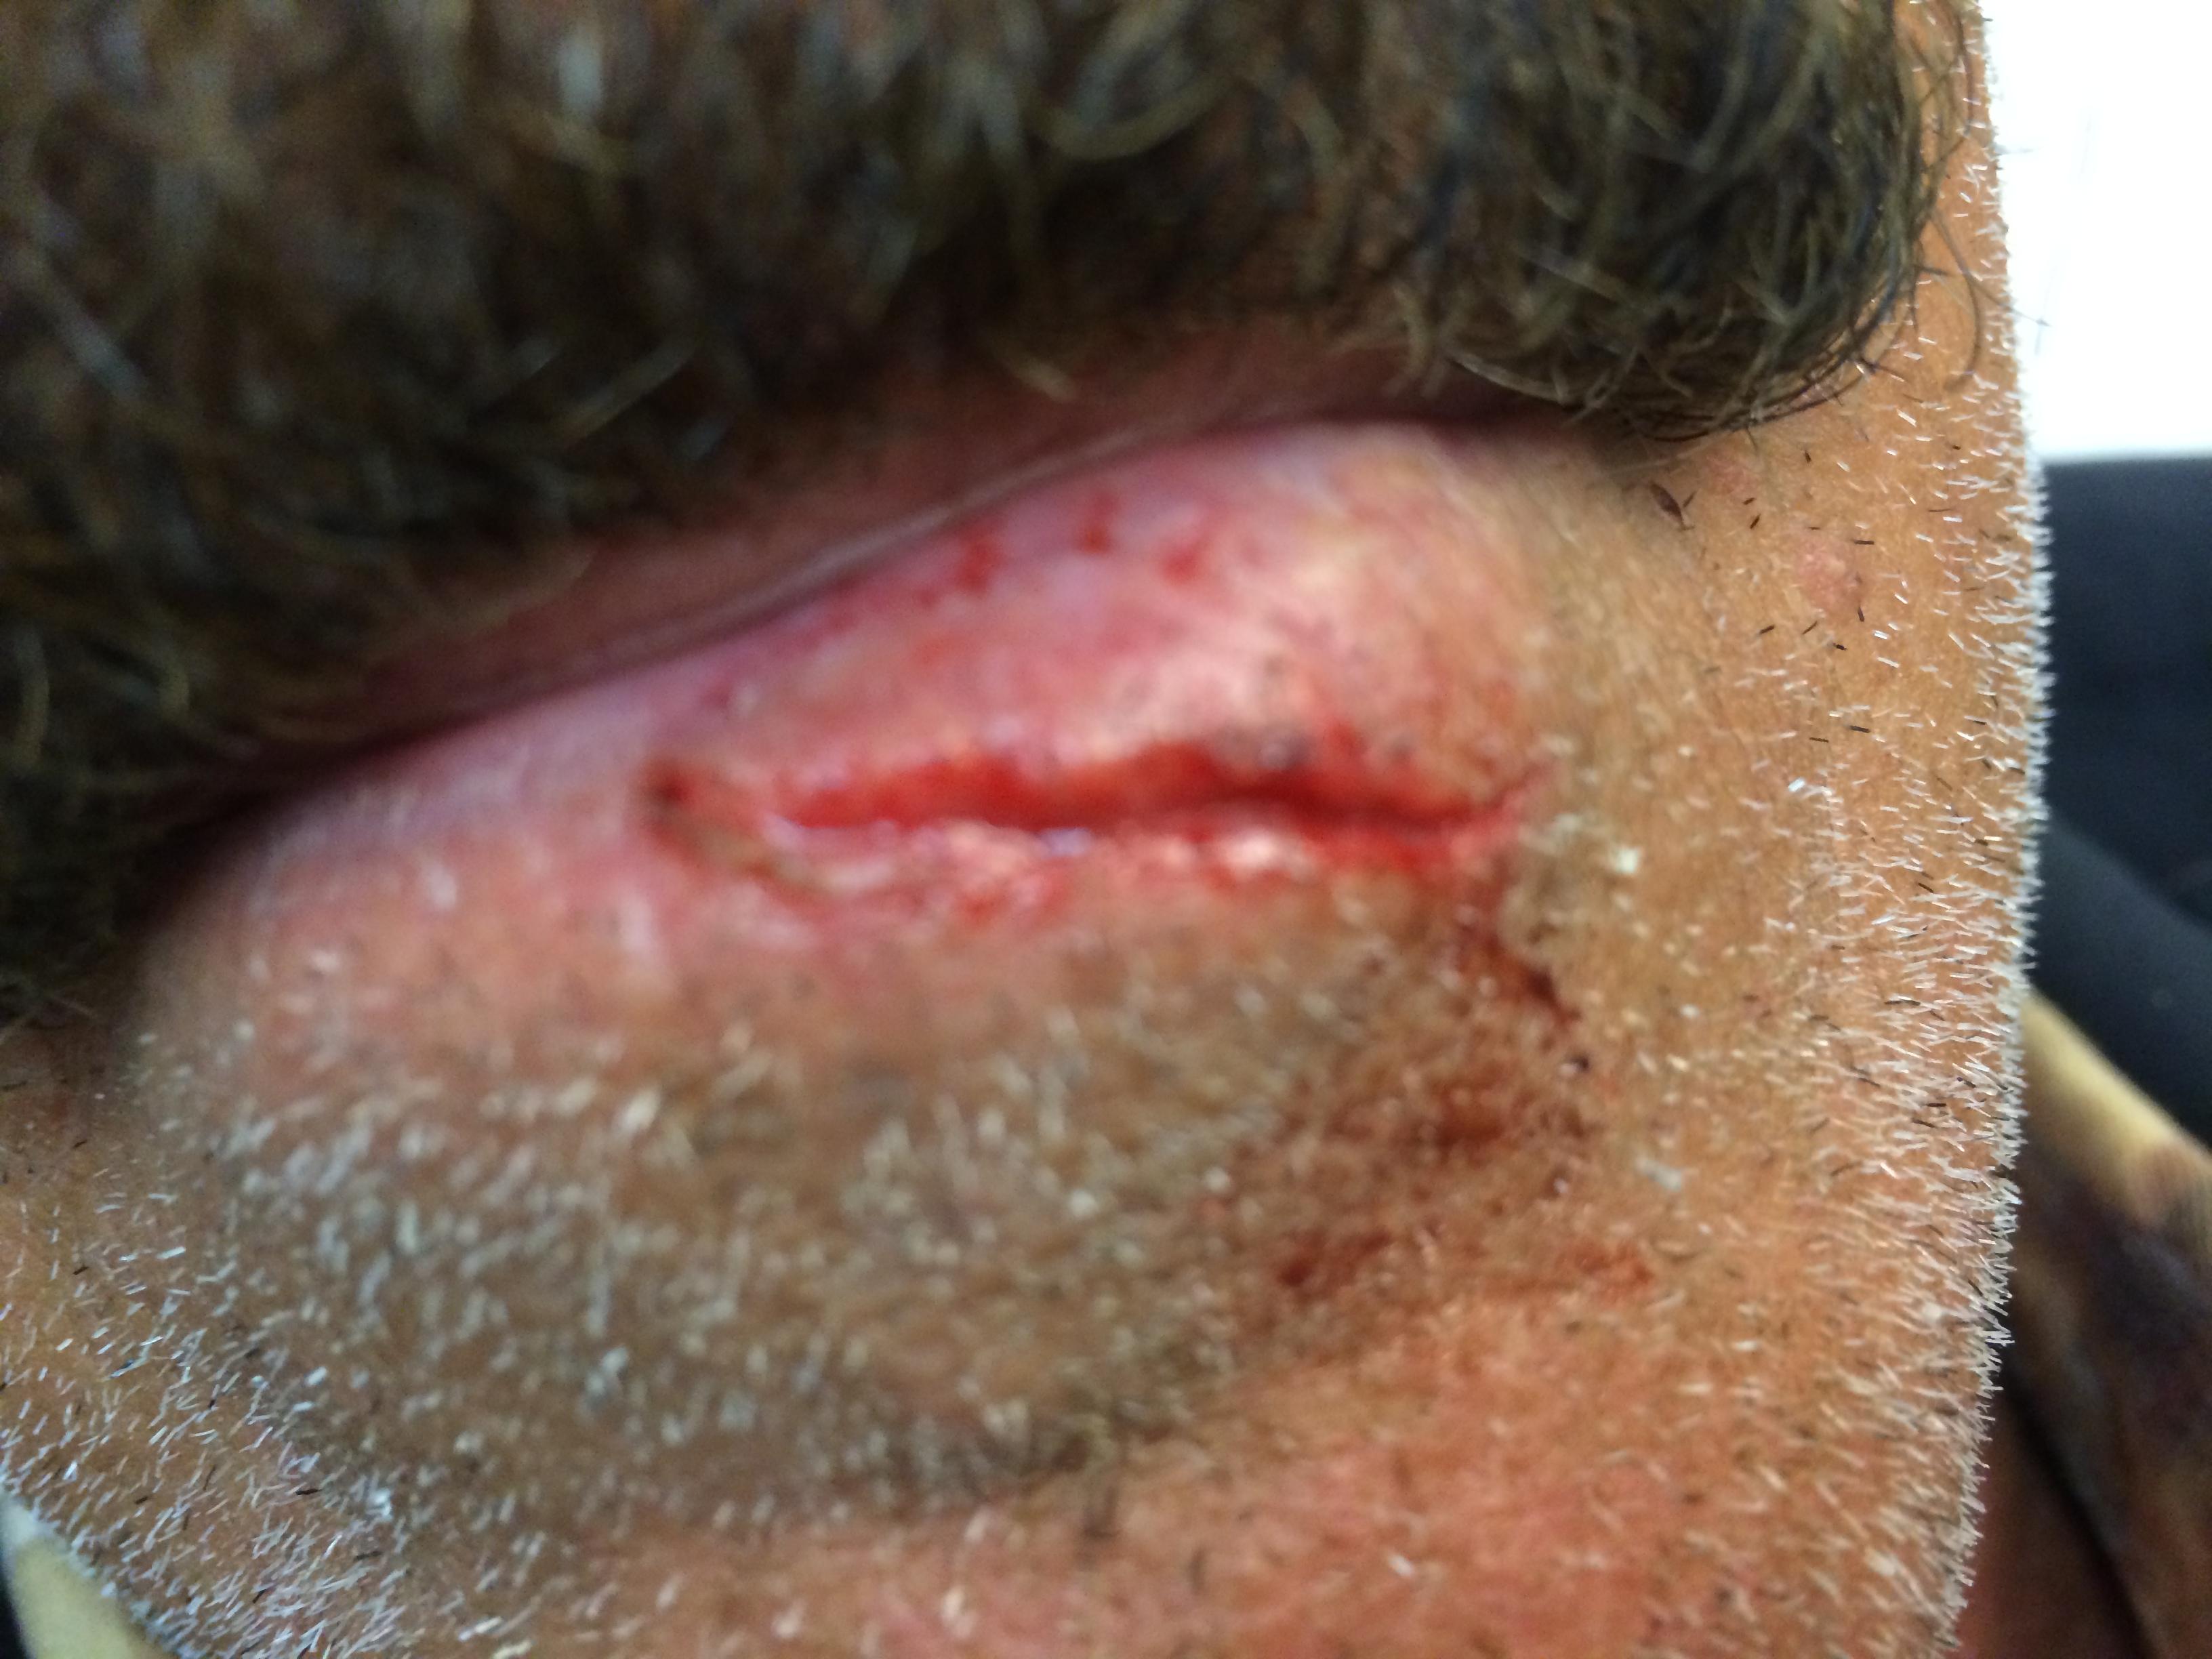 Lip Laceration Repair | Best Dental in Houston, TX